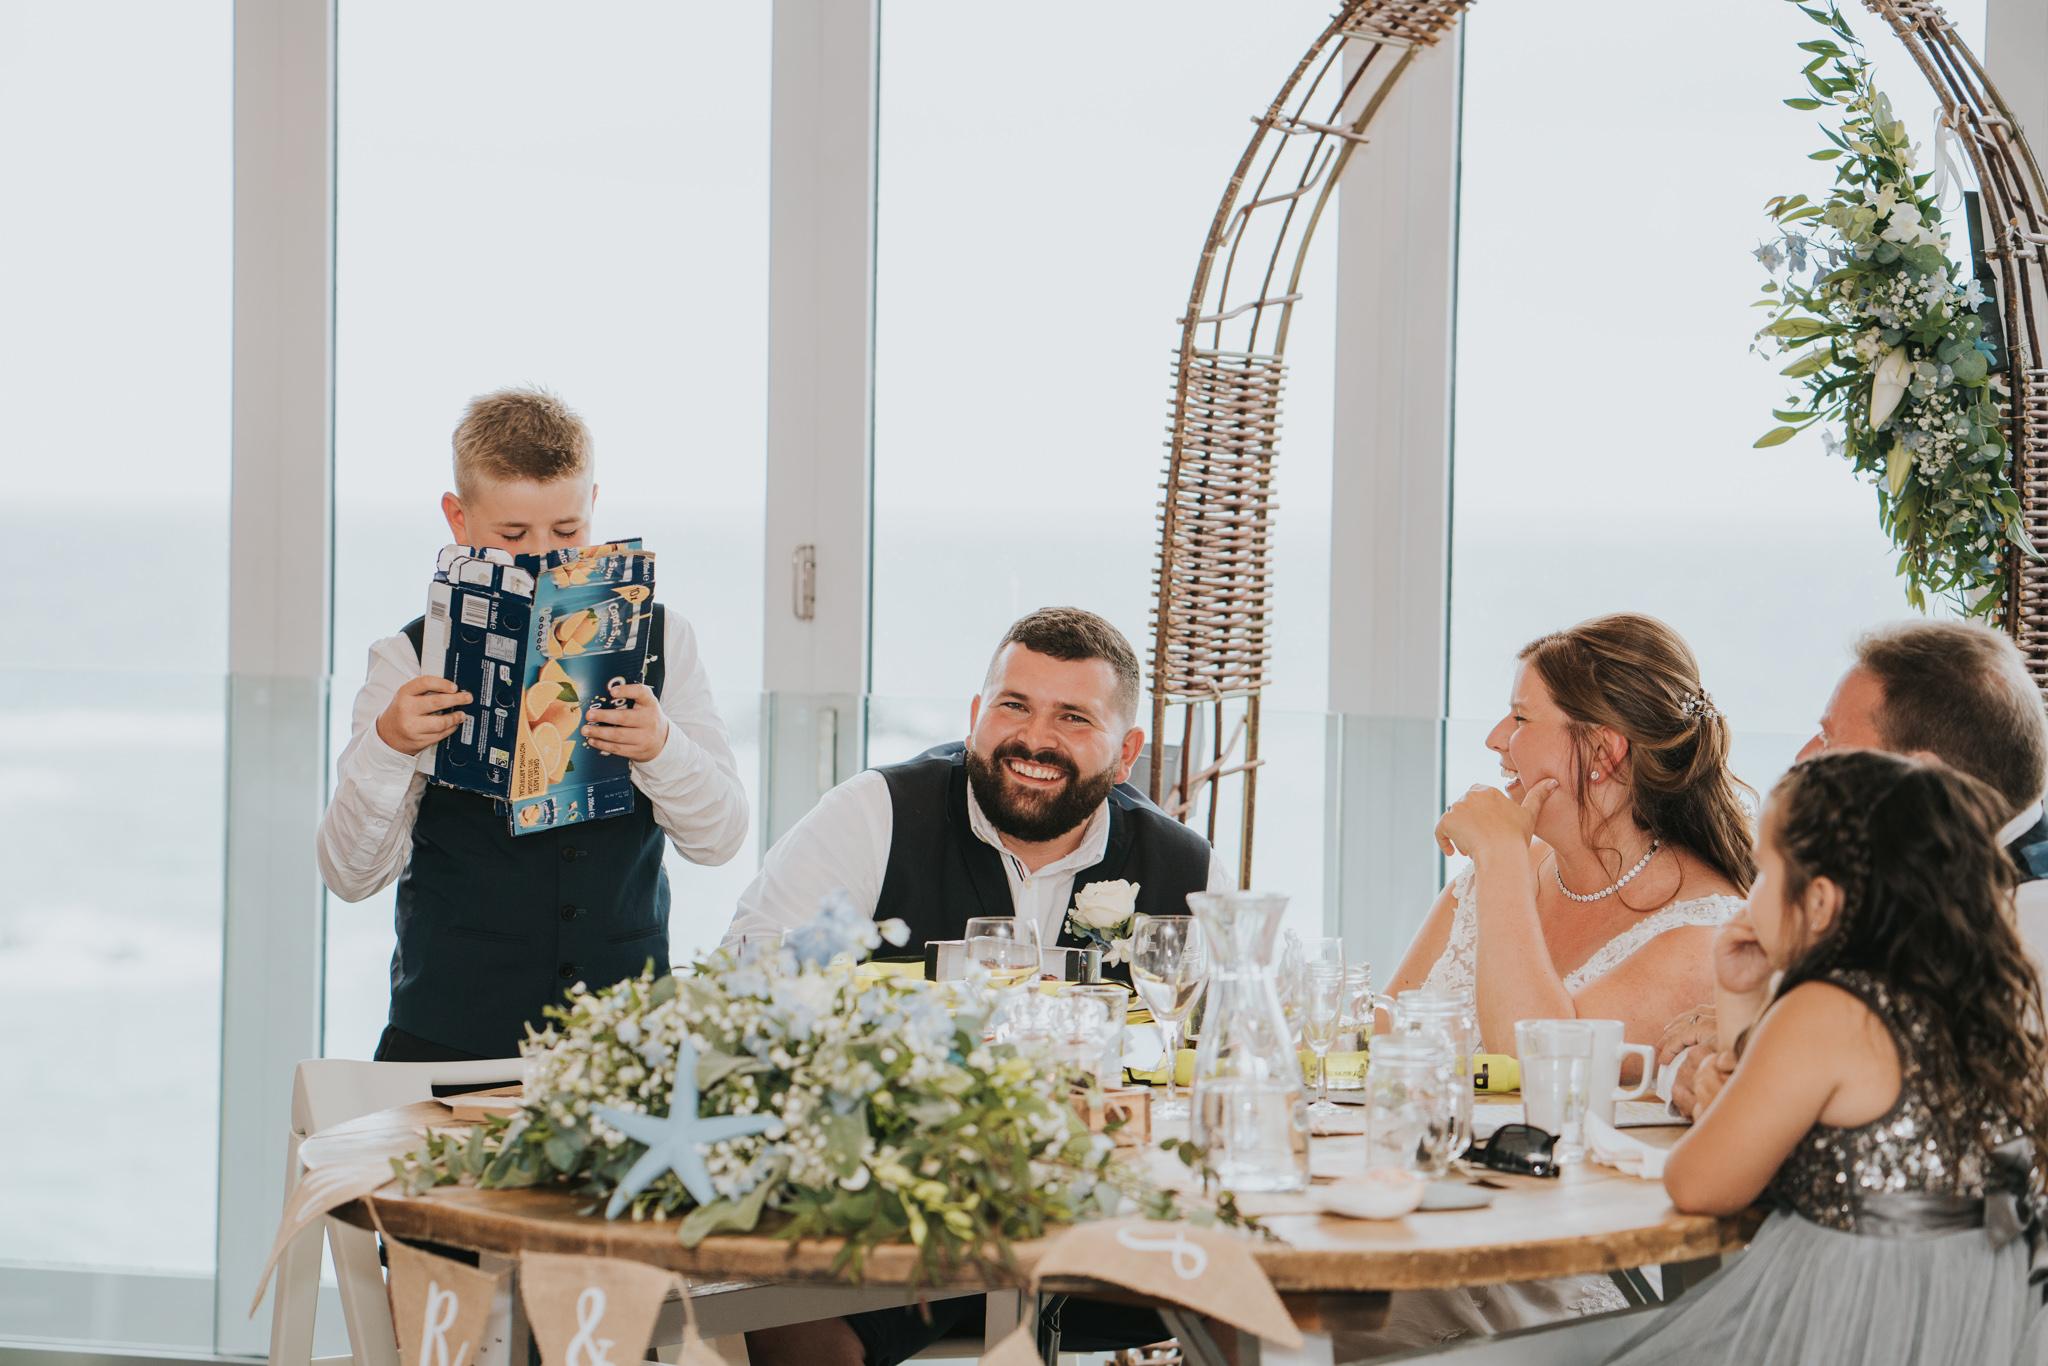 john-amy-relaxed-beach-wedding-tunnels-beaches-ilfracombe-north-devon-grace-elizabeth-colchester-essex-alternative-relaxed-wedding-photography-devon-suffolk-norfolk-essex (120 of 159).jpg